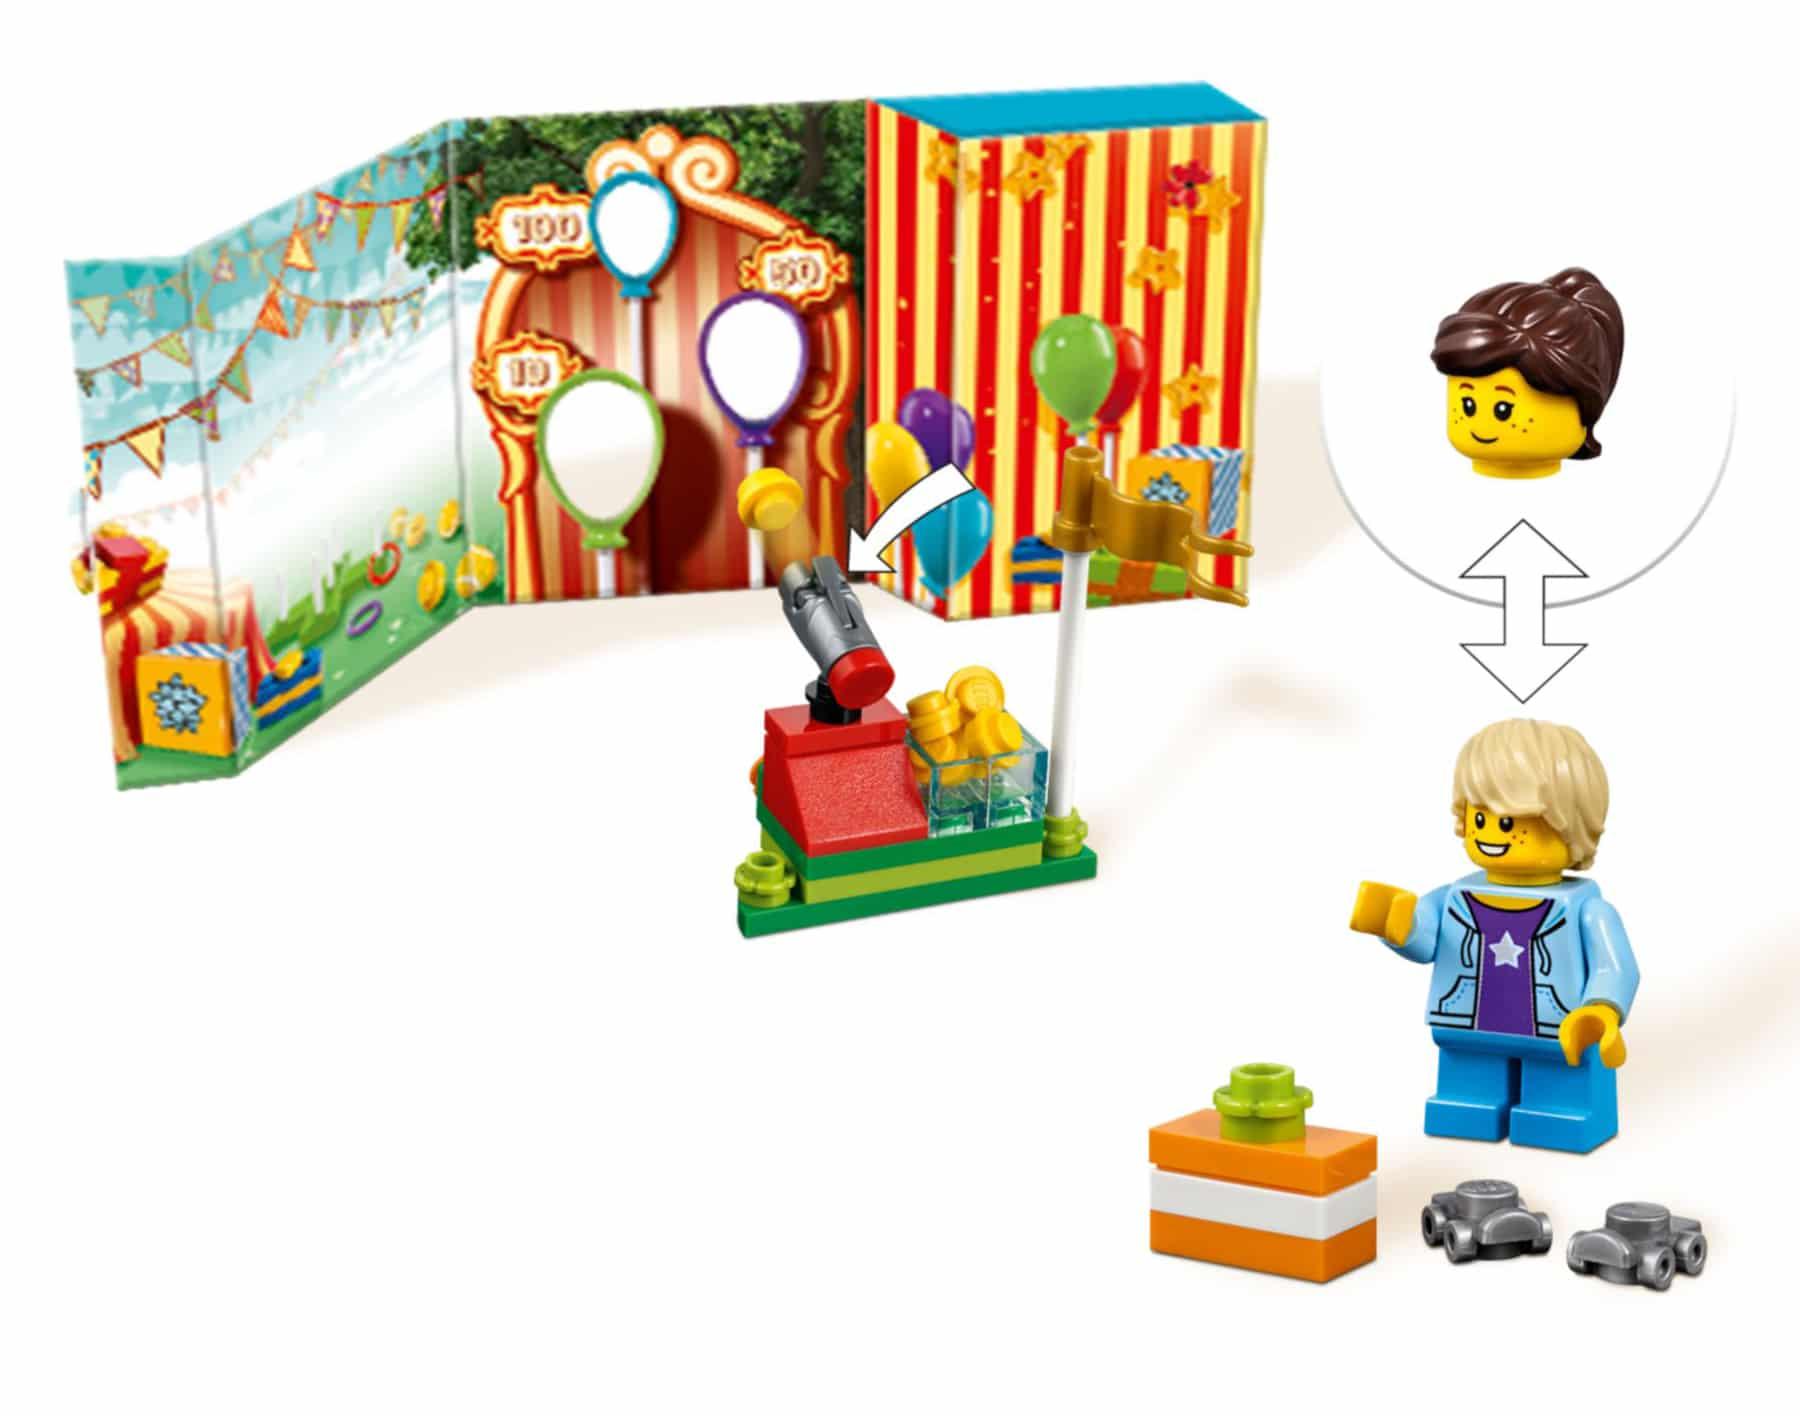 LEGO 853906 Grußkarte